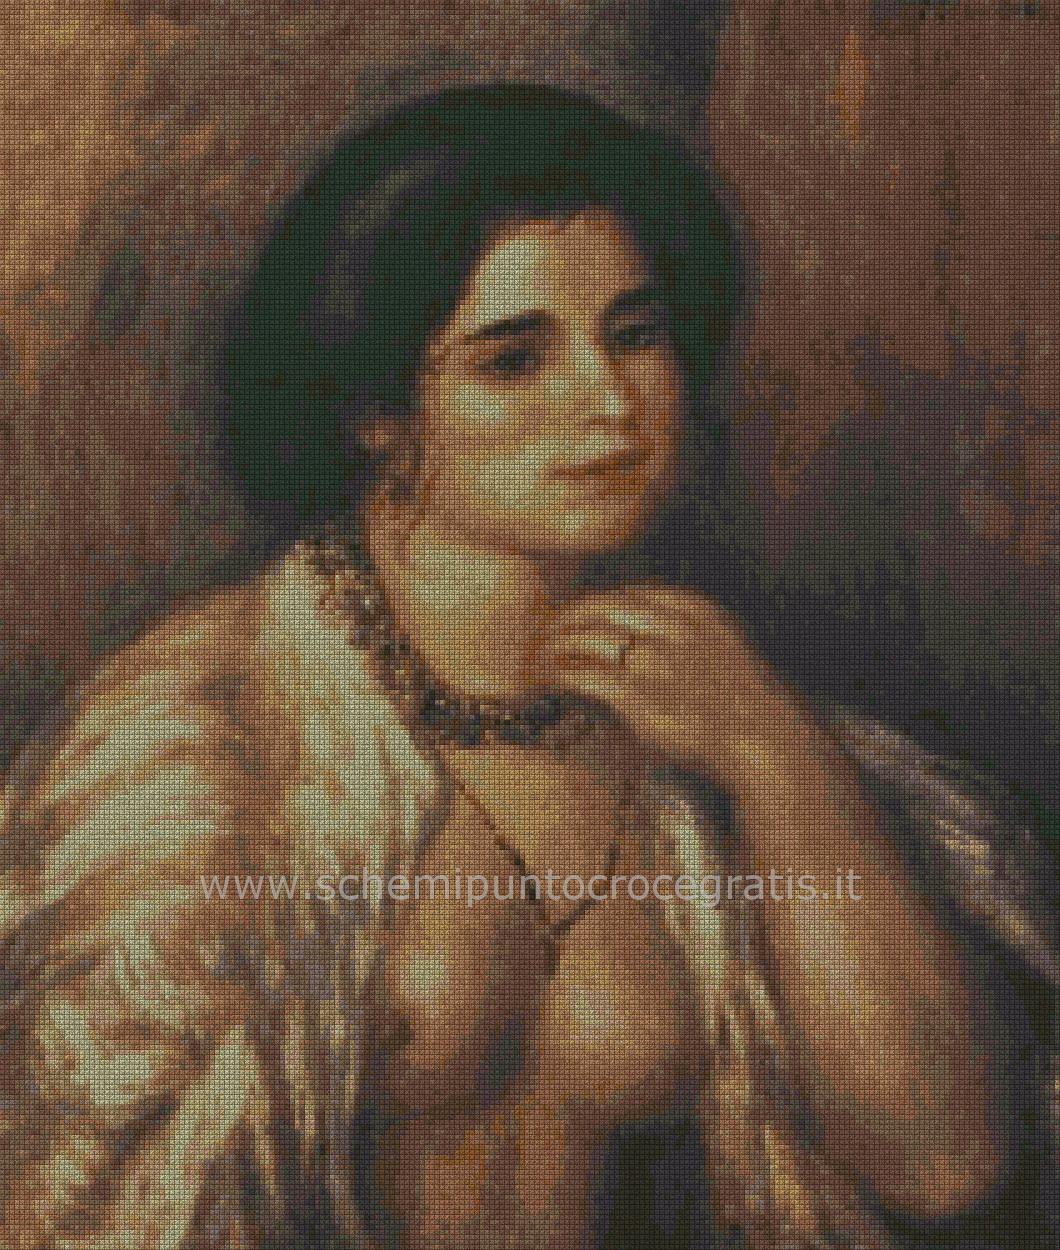 pittori_moderni/renoir/Renoir17.jpg